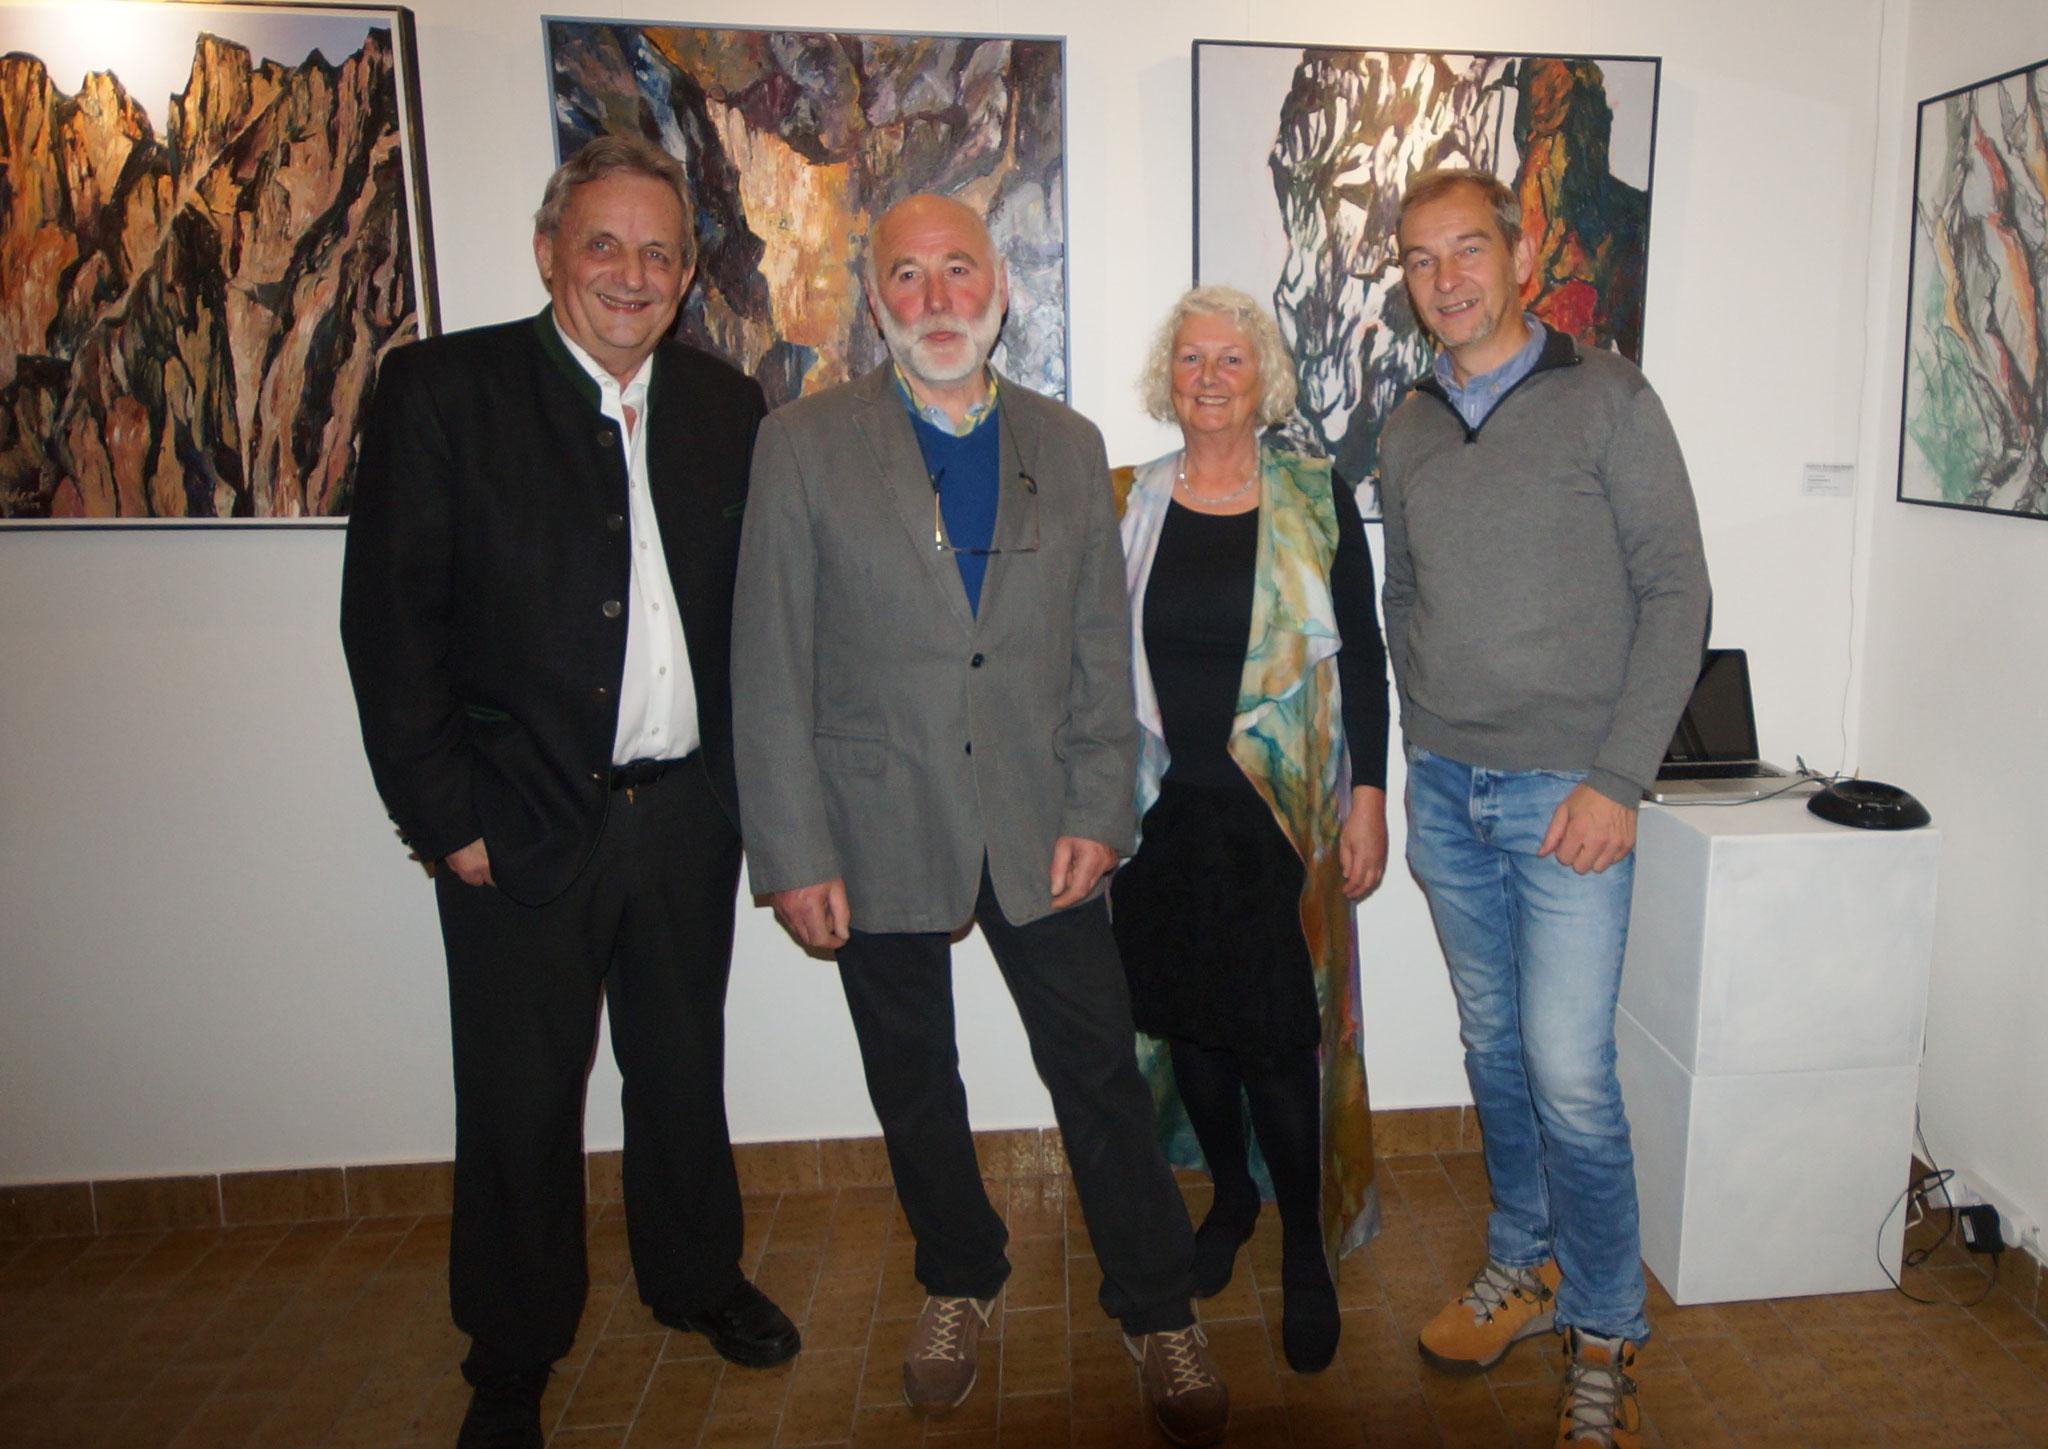 David Bullock, Georg Schreder, Roswitha Foch, Bgm. Hermann Rohrmoser